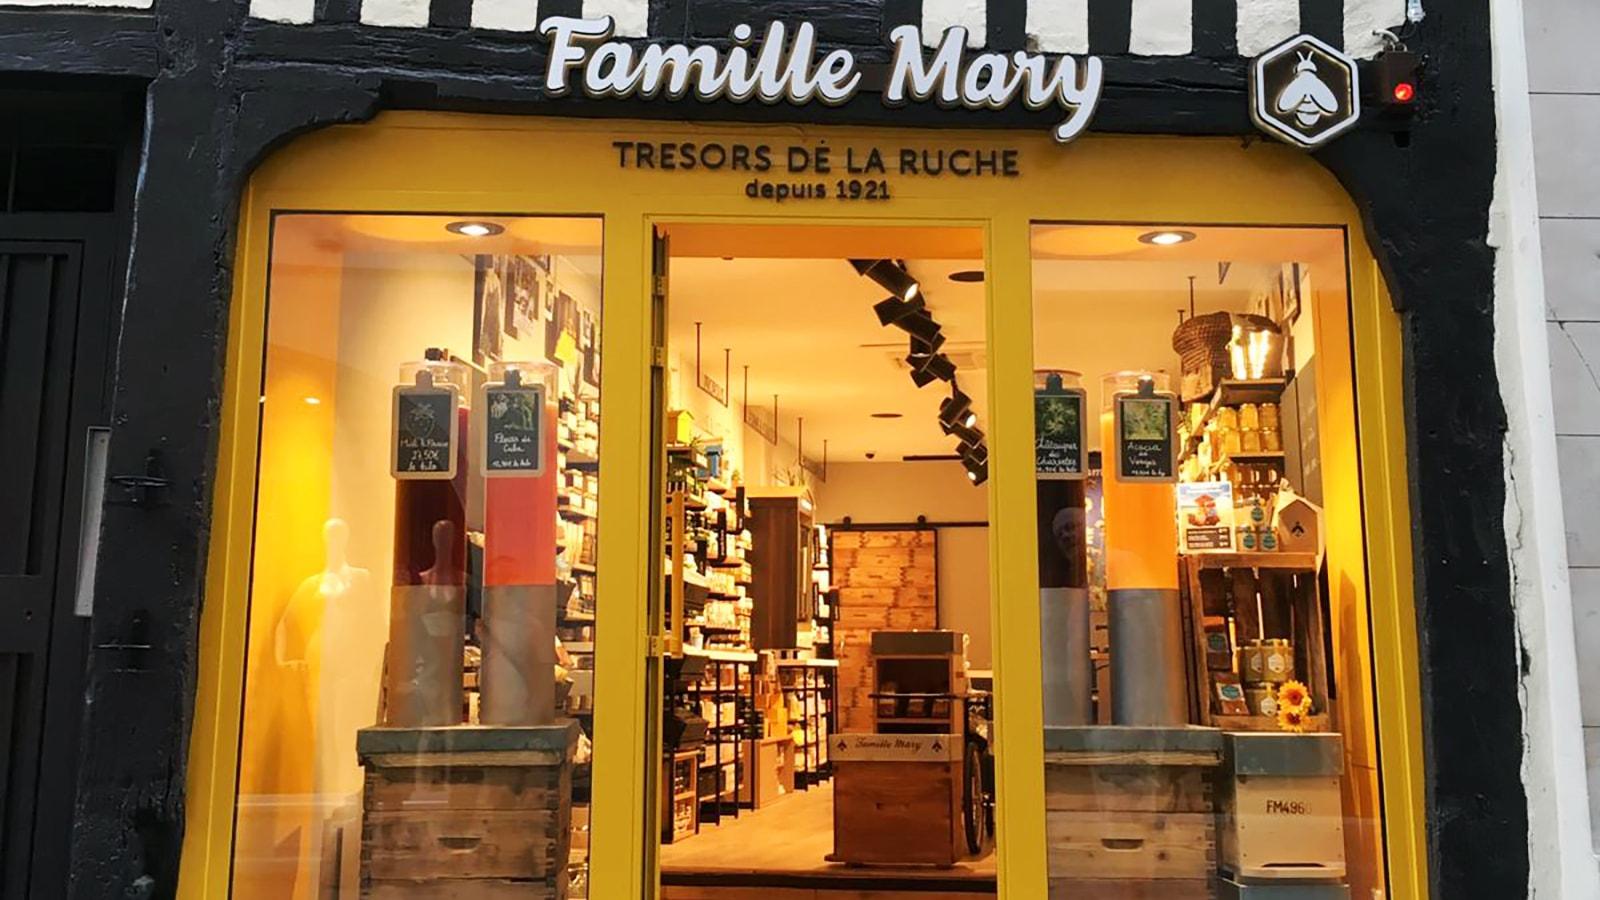 EFI DESIGN Boutique Famille Mary Efi Design 6